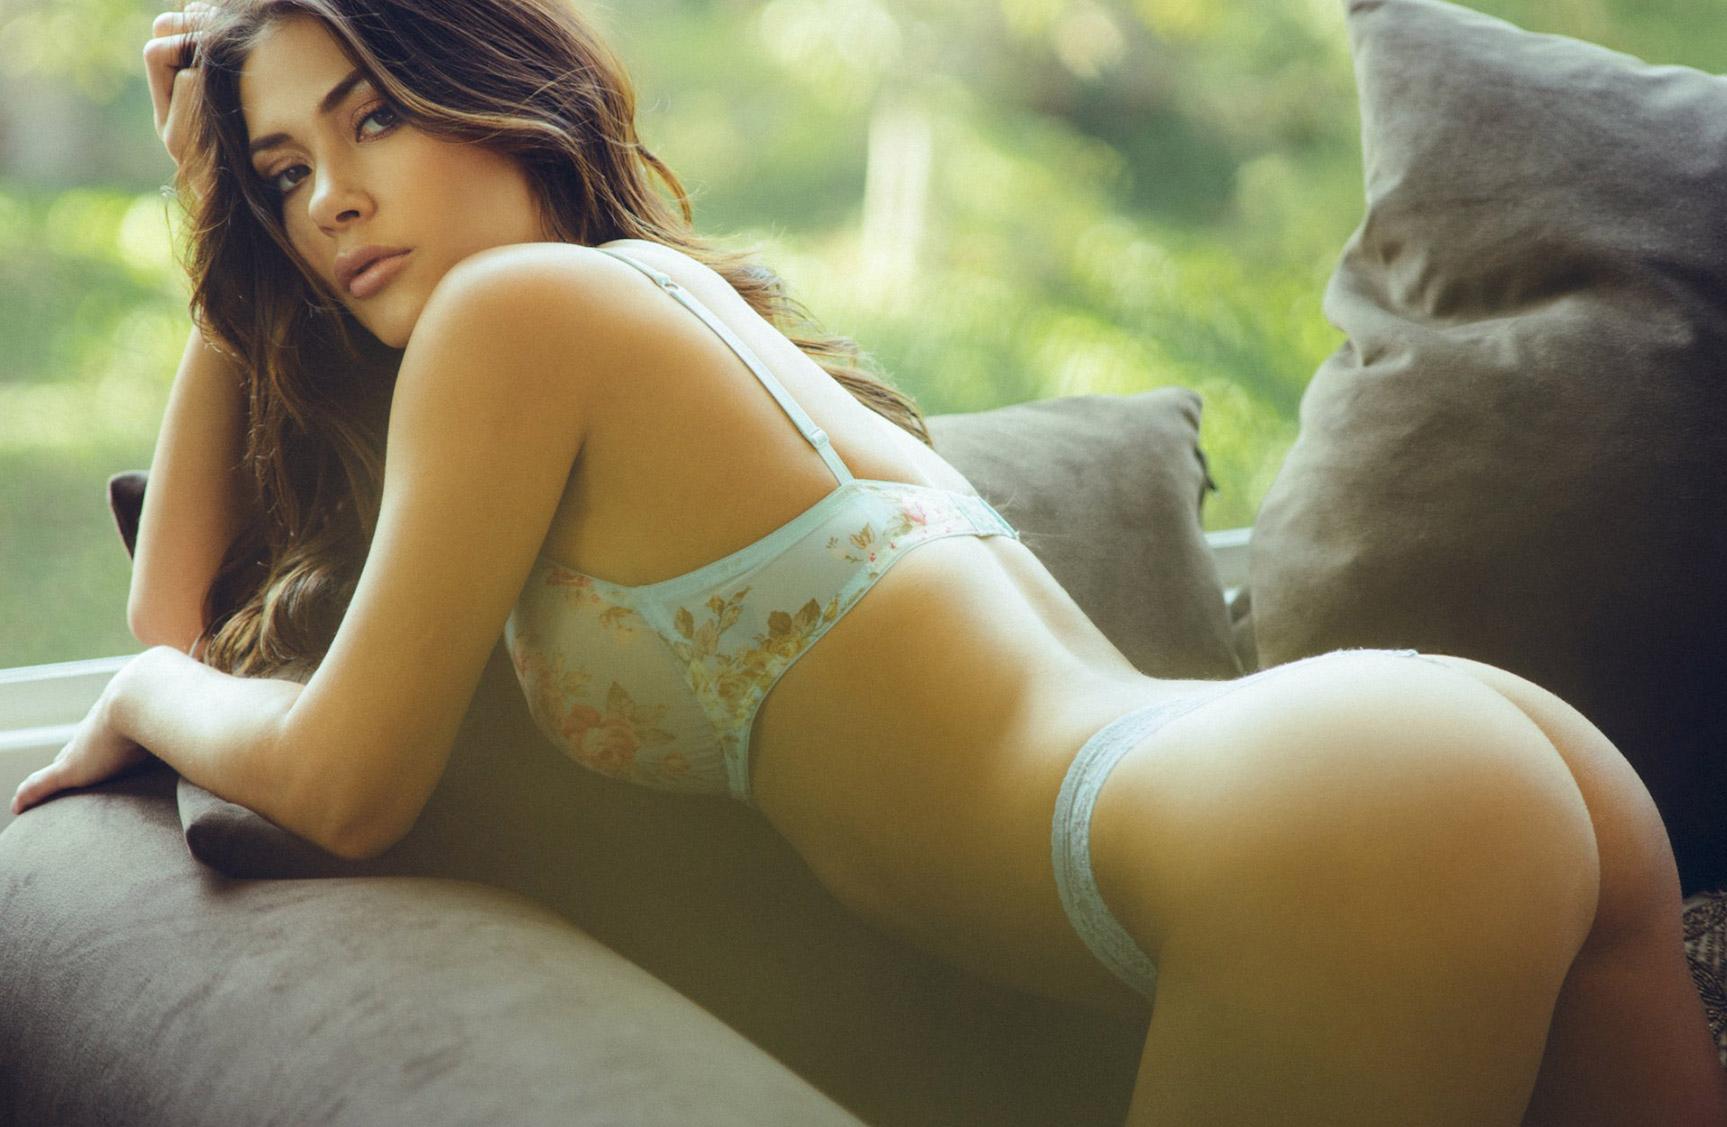 Арианни Селесте в нижнем белье / lingerie photo - Arianny Celeste by Ben Tsui